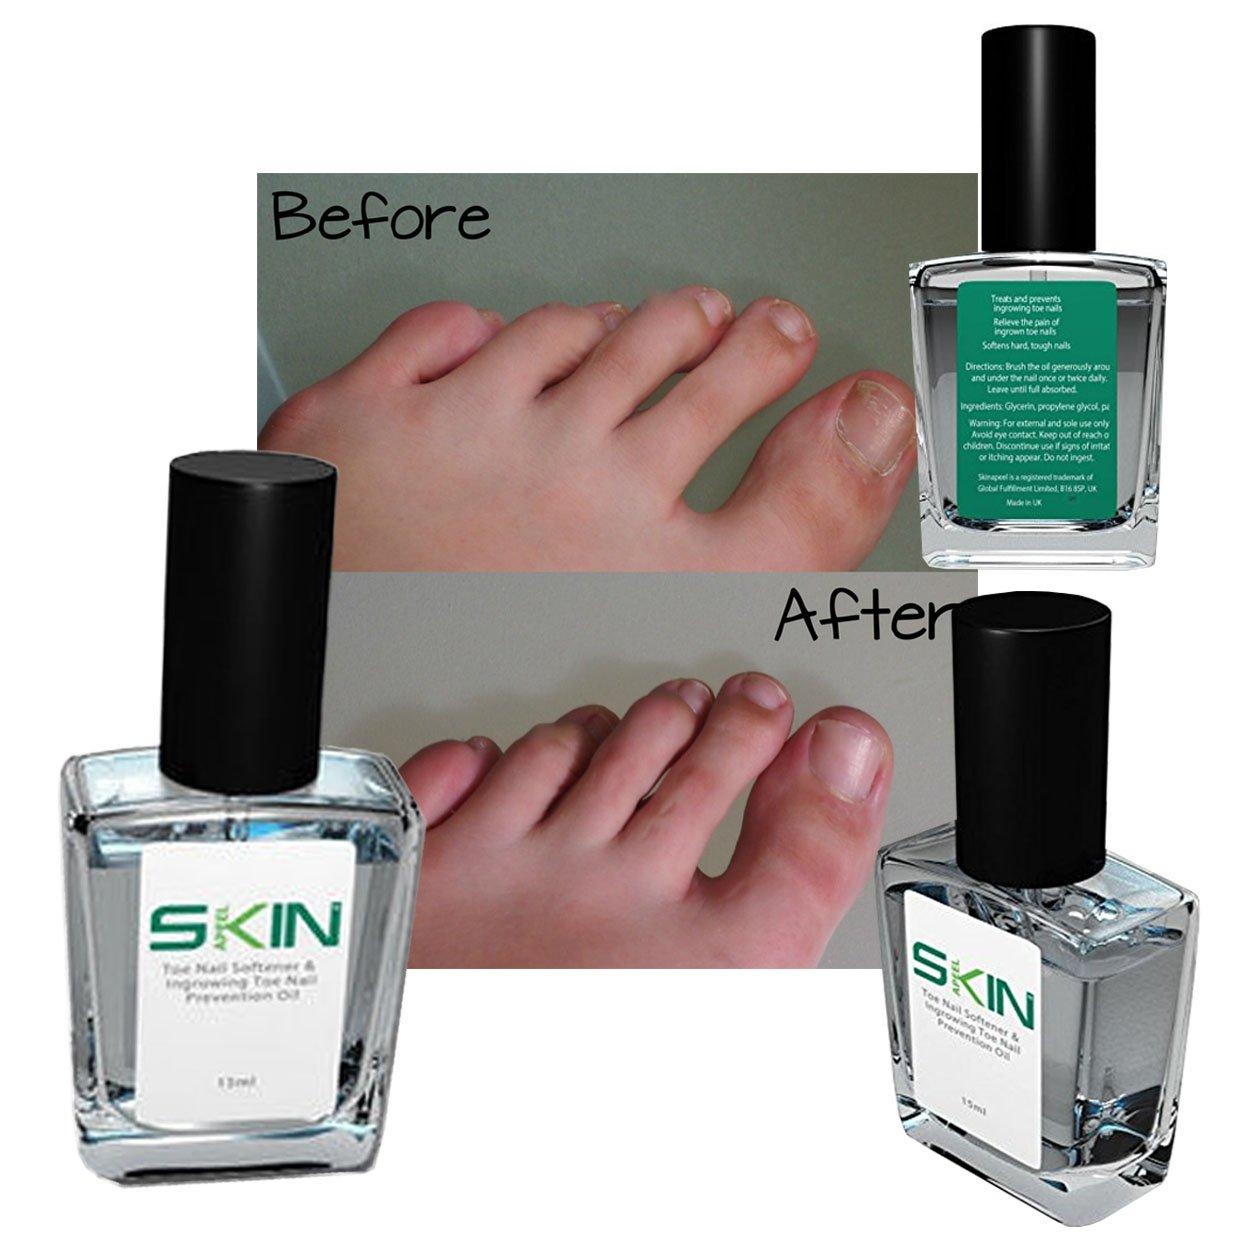 Amazon.com : Skinapeel Toe Nail Softener & Ingrowing Toenail ...